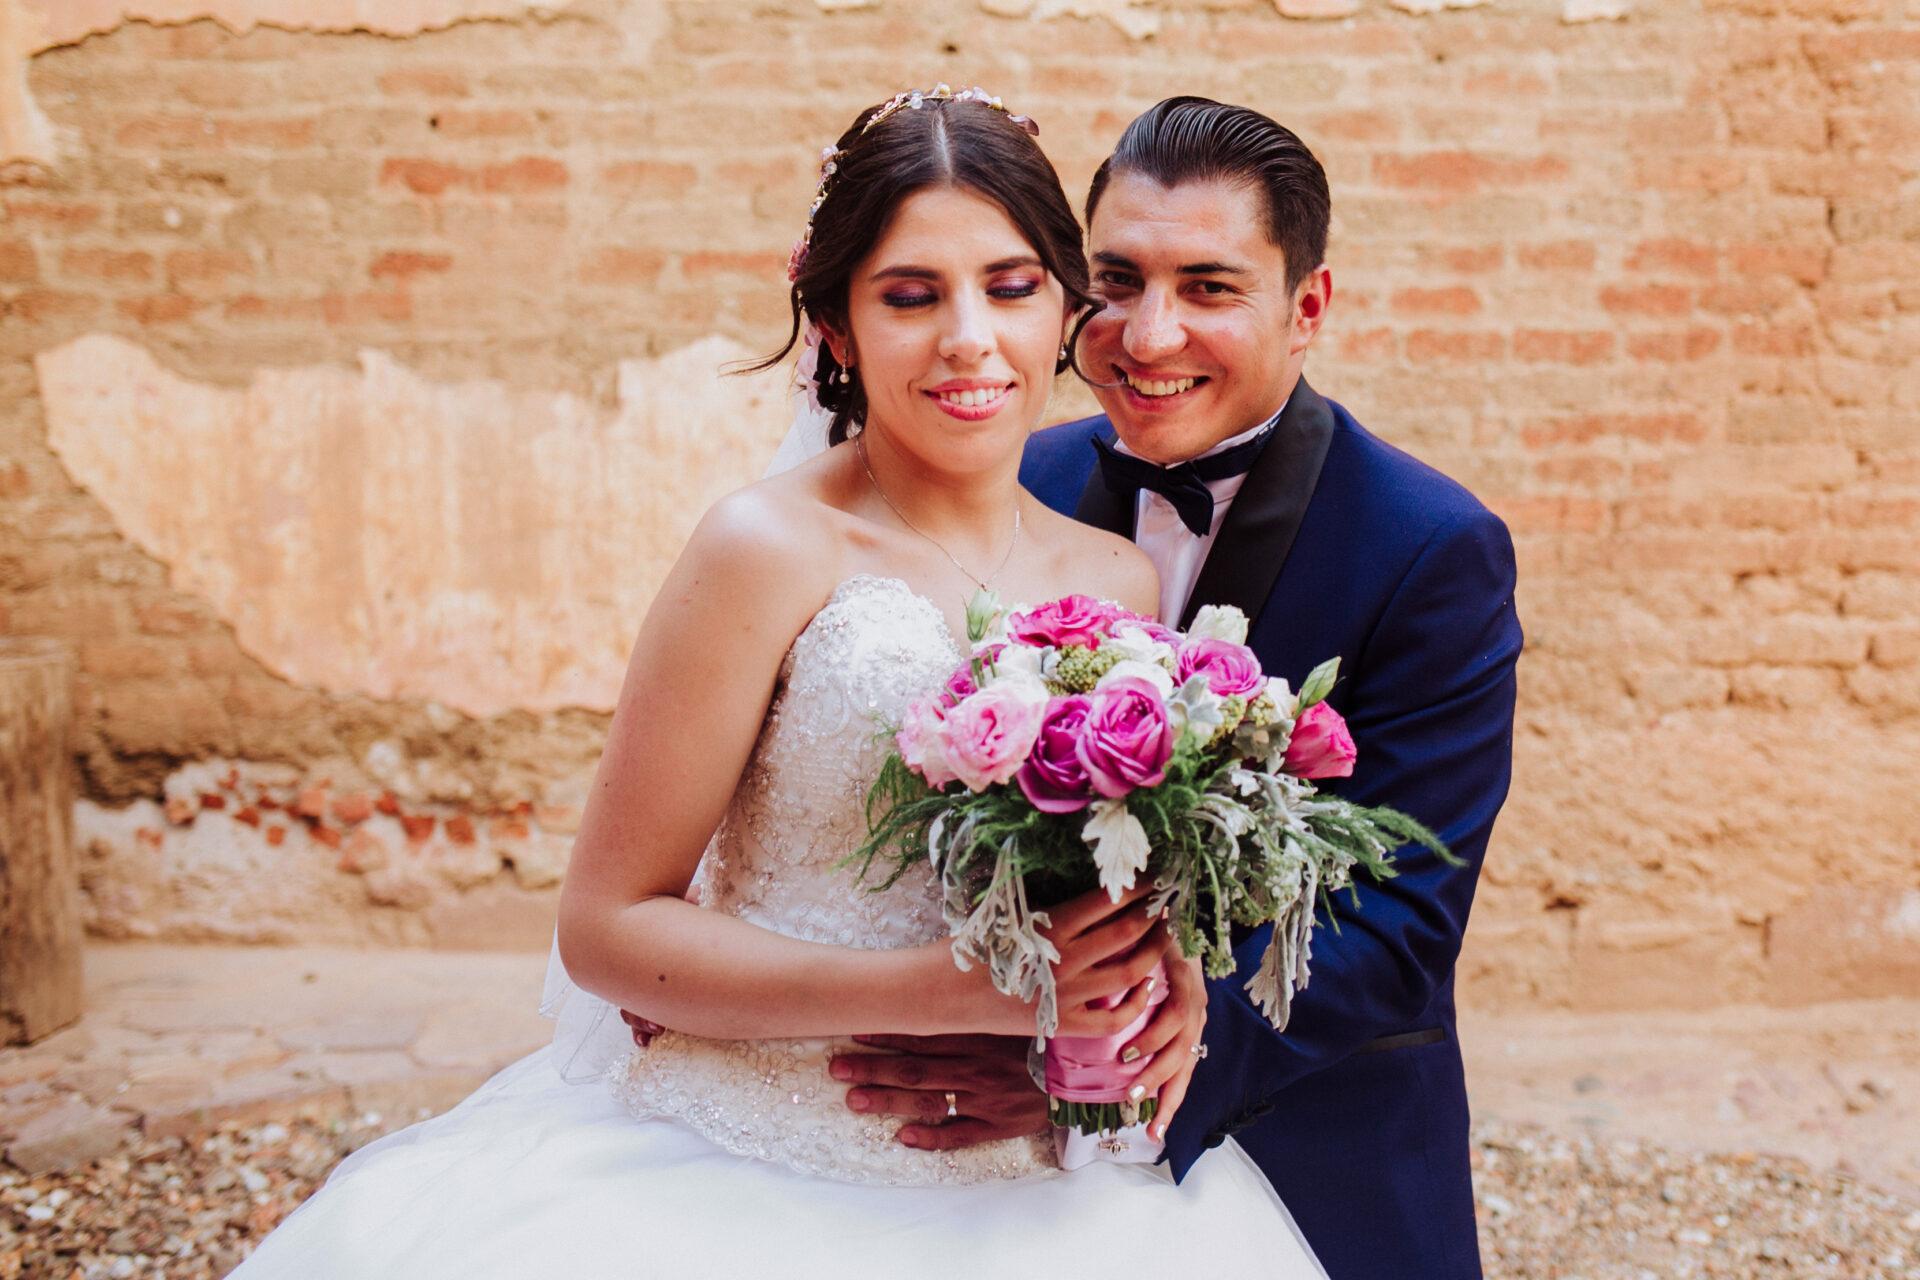 javier_noriega_fotografo_bodas_exhacienda_las_mercedes_zacatecas_wedding_photographer22a